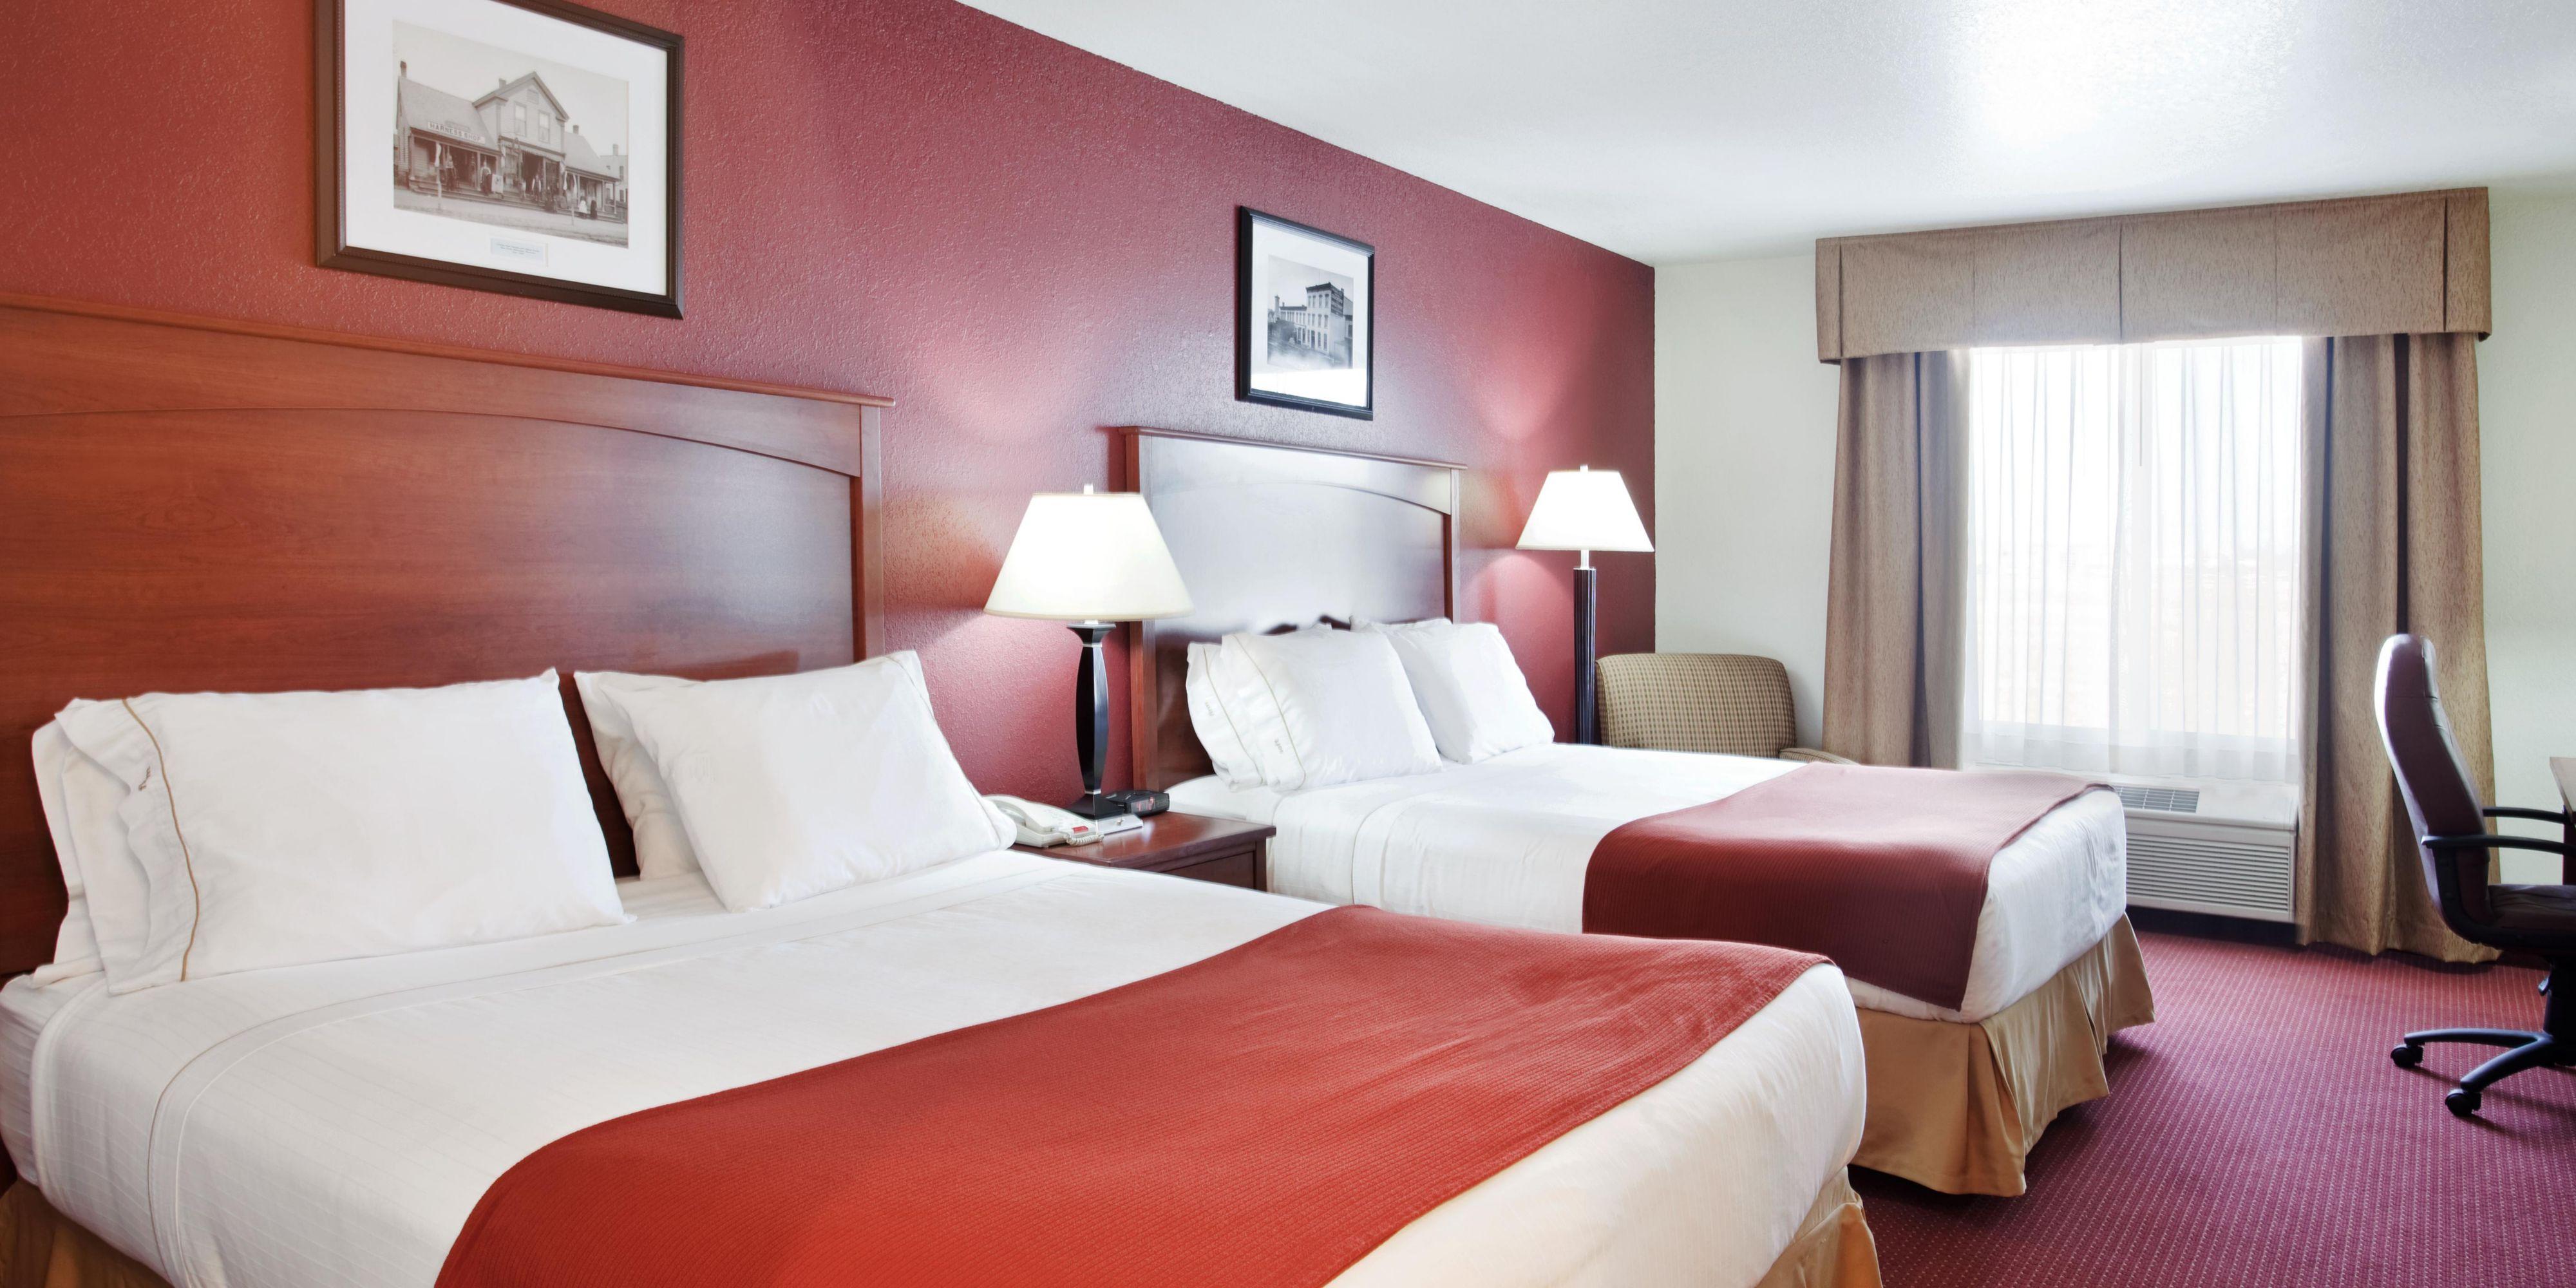 Holiday Inn Express Watertown 2533104148 2x1